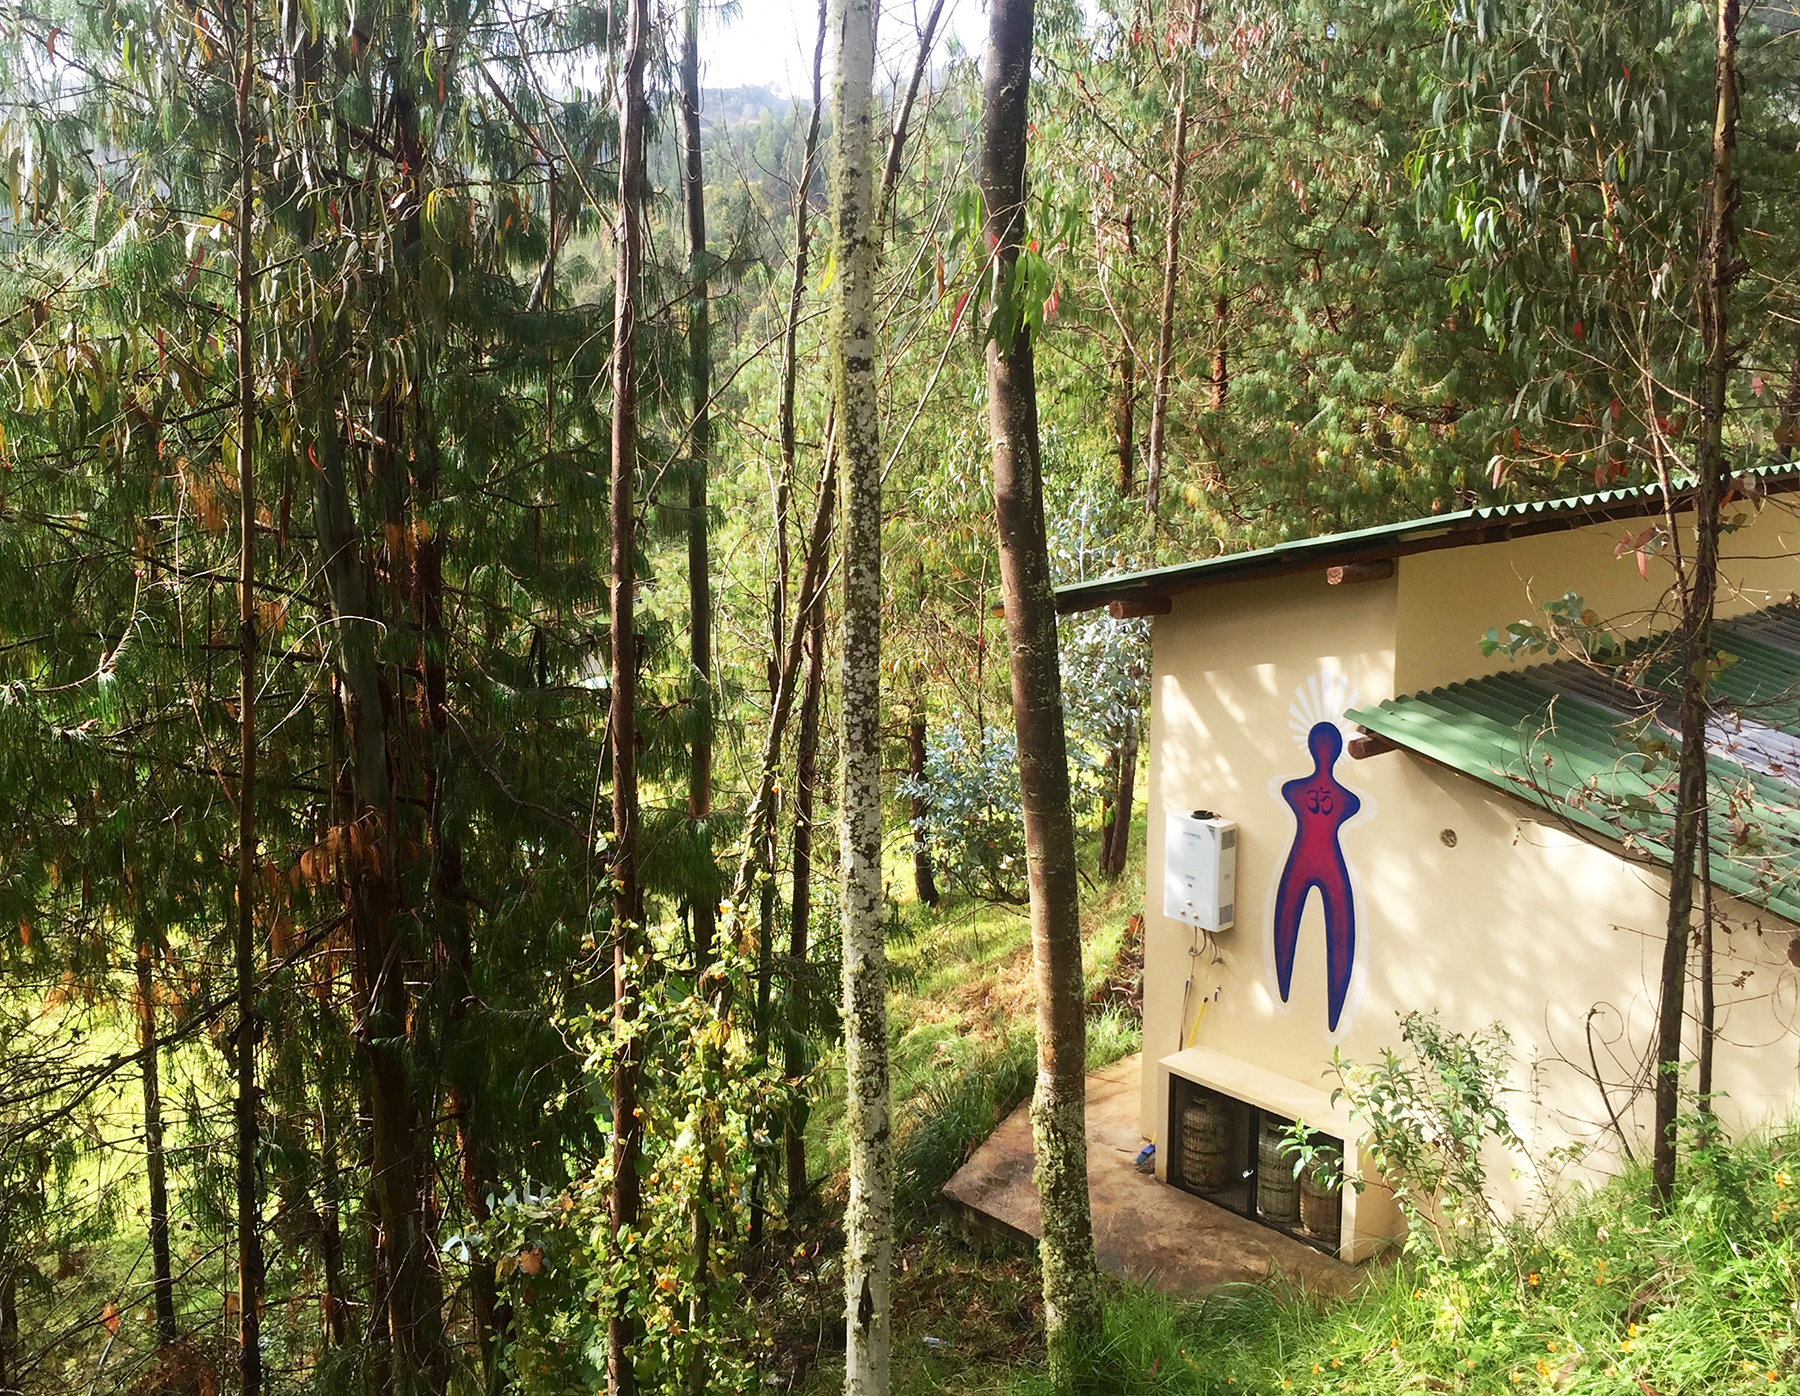 murals_gaiasagrada2.jpg